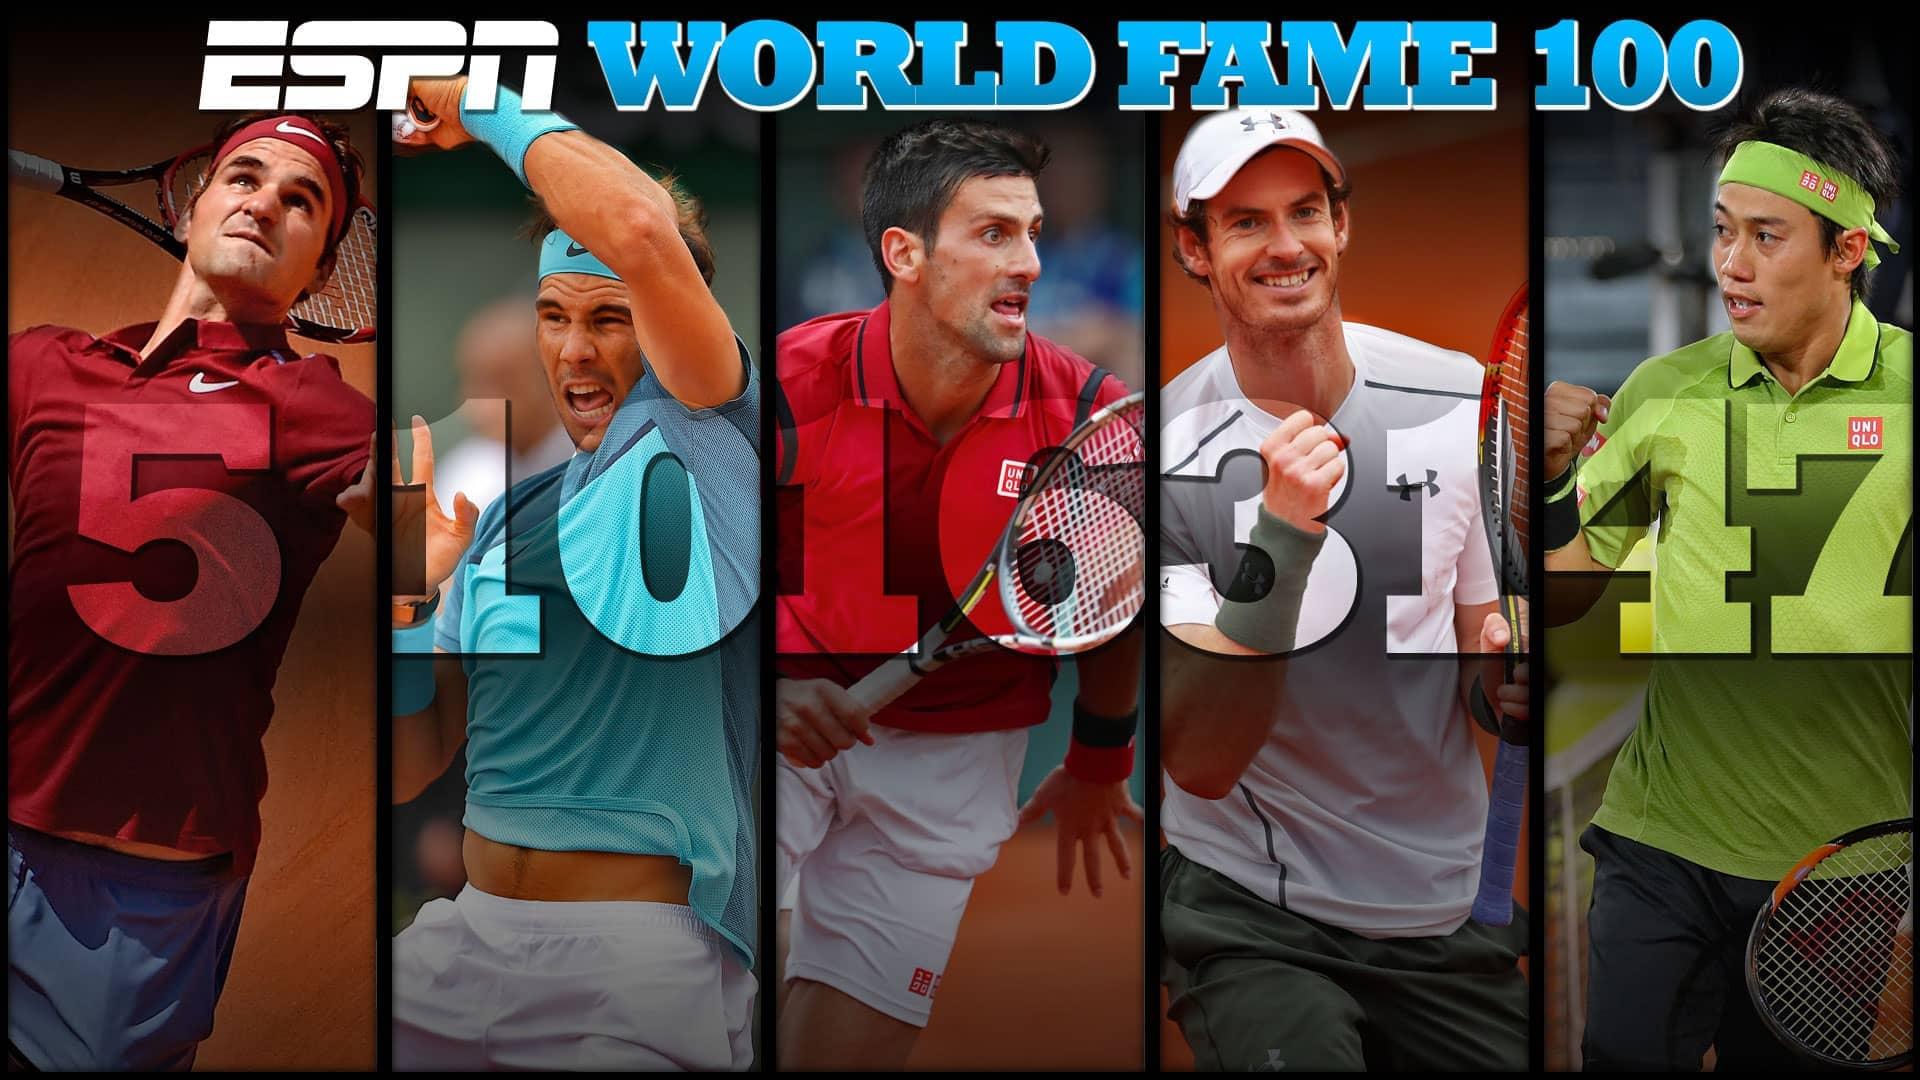 Federer Fifth In 2016 ESPN World Fame 100 | ATP World Tour | Tennis